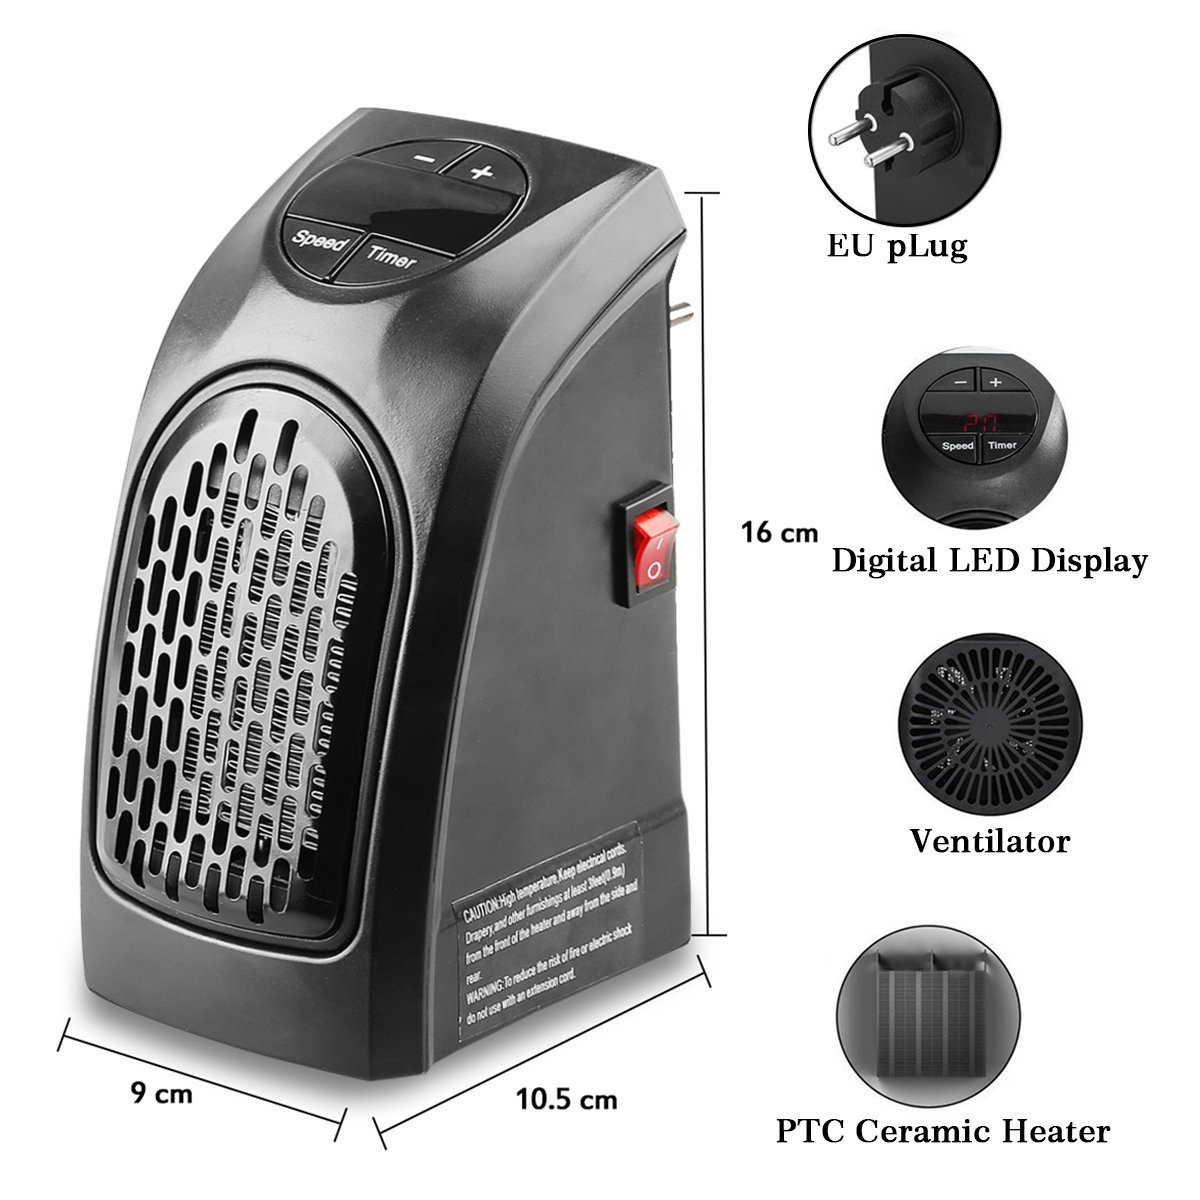 Mini Stufa Stufetta Elettrica Riscaldatore Portatile Stove Handy